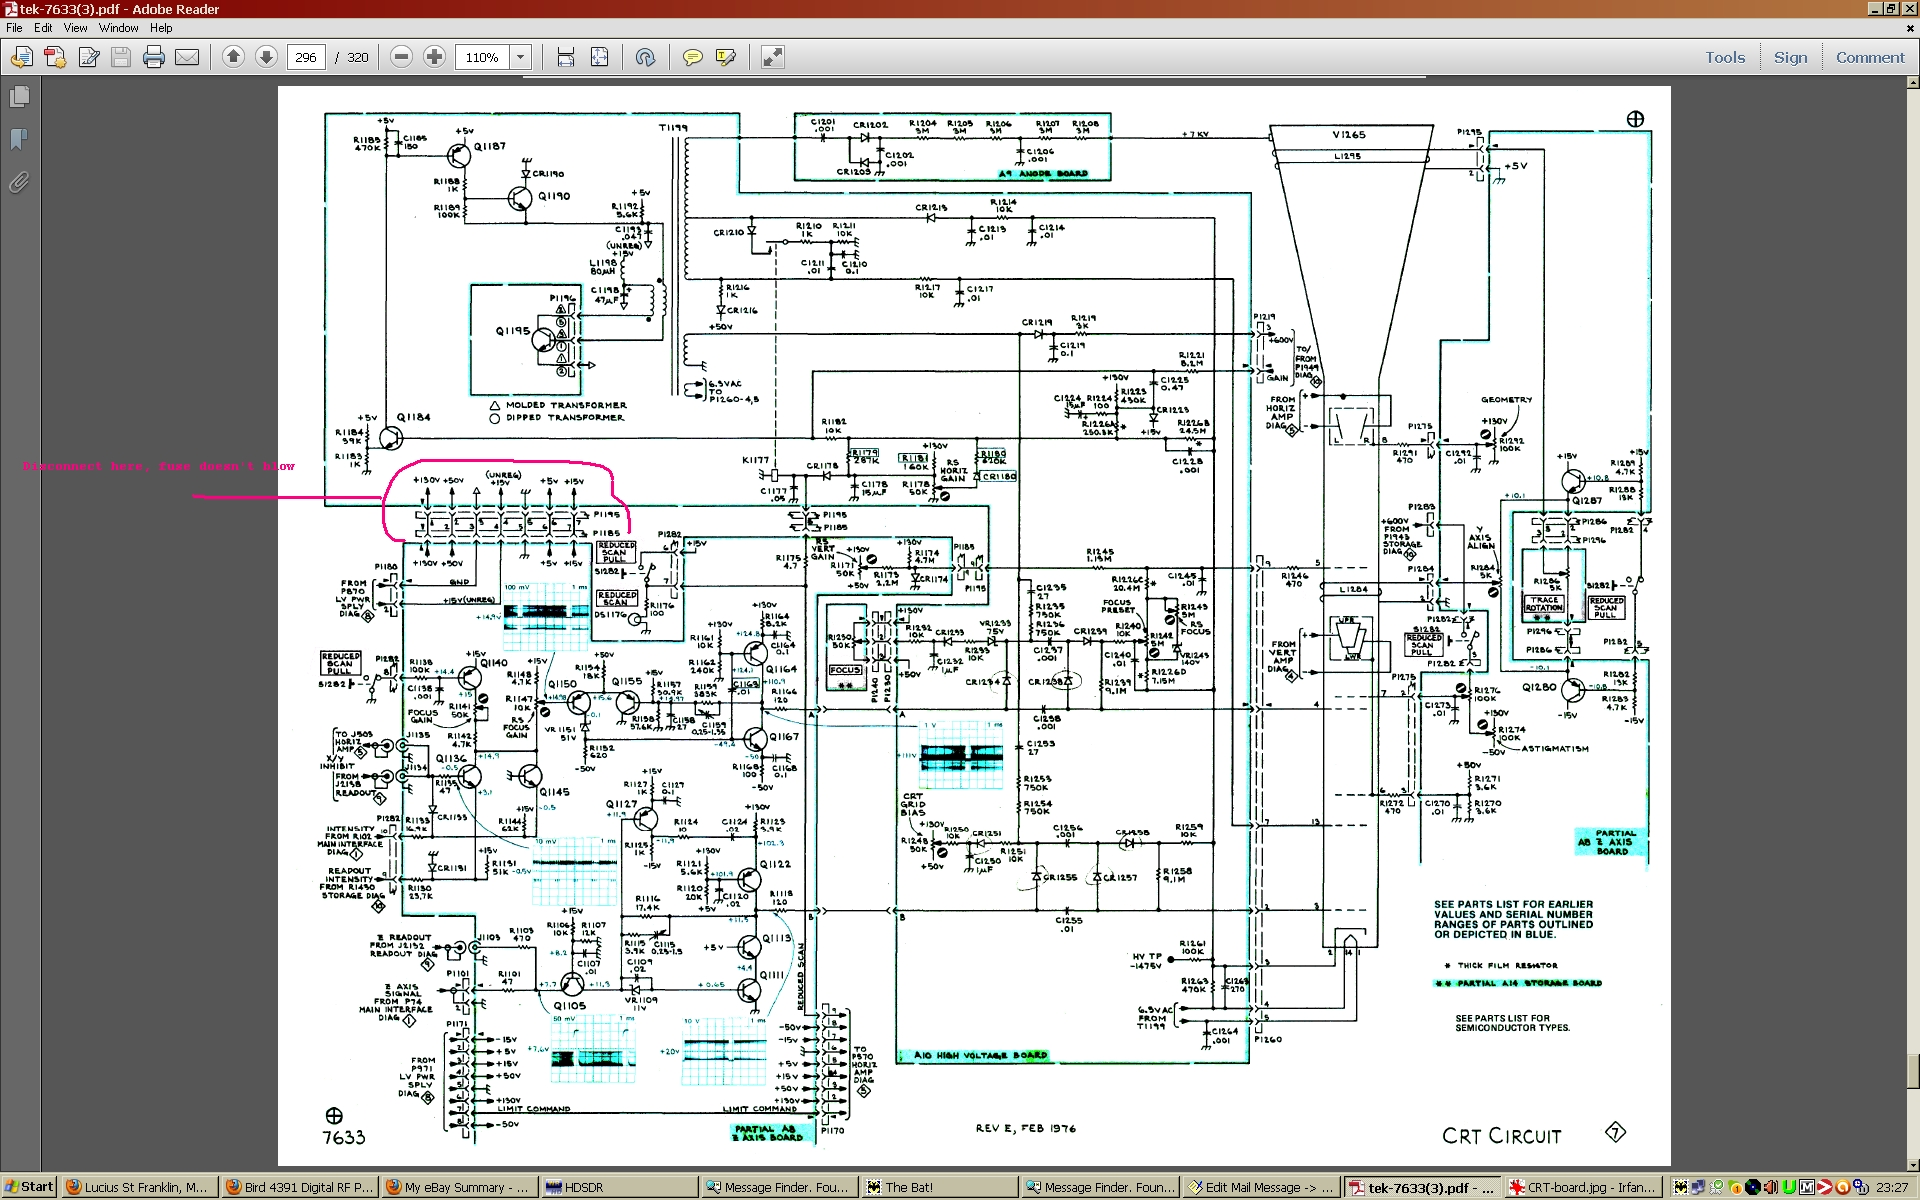 7633 crt hv circuit issues rh groups io